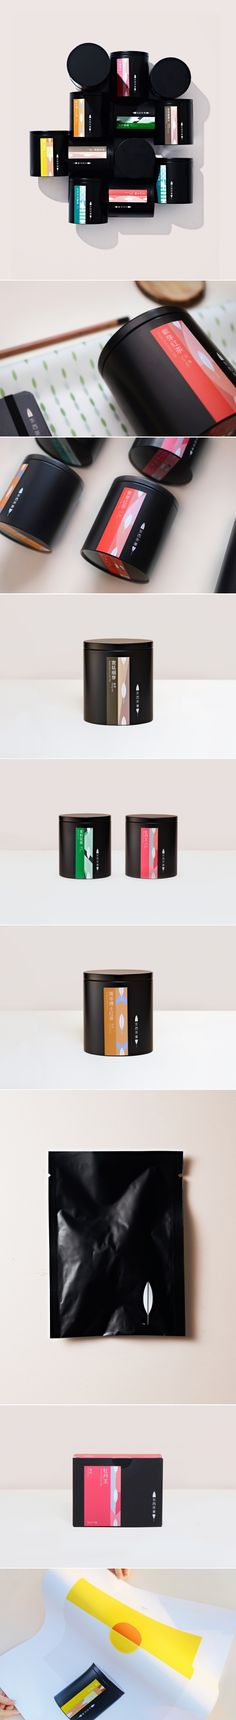 Any Tea — The Dieline - Branding & Packaging Design